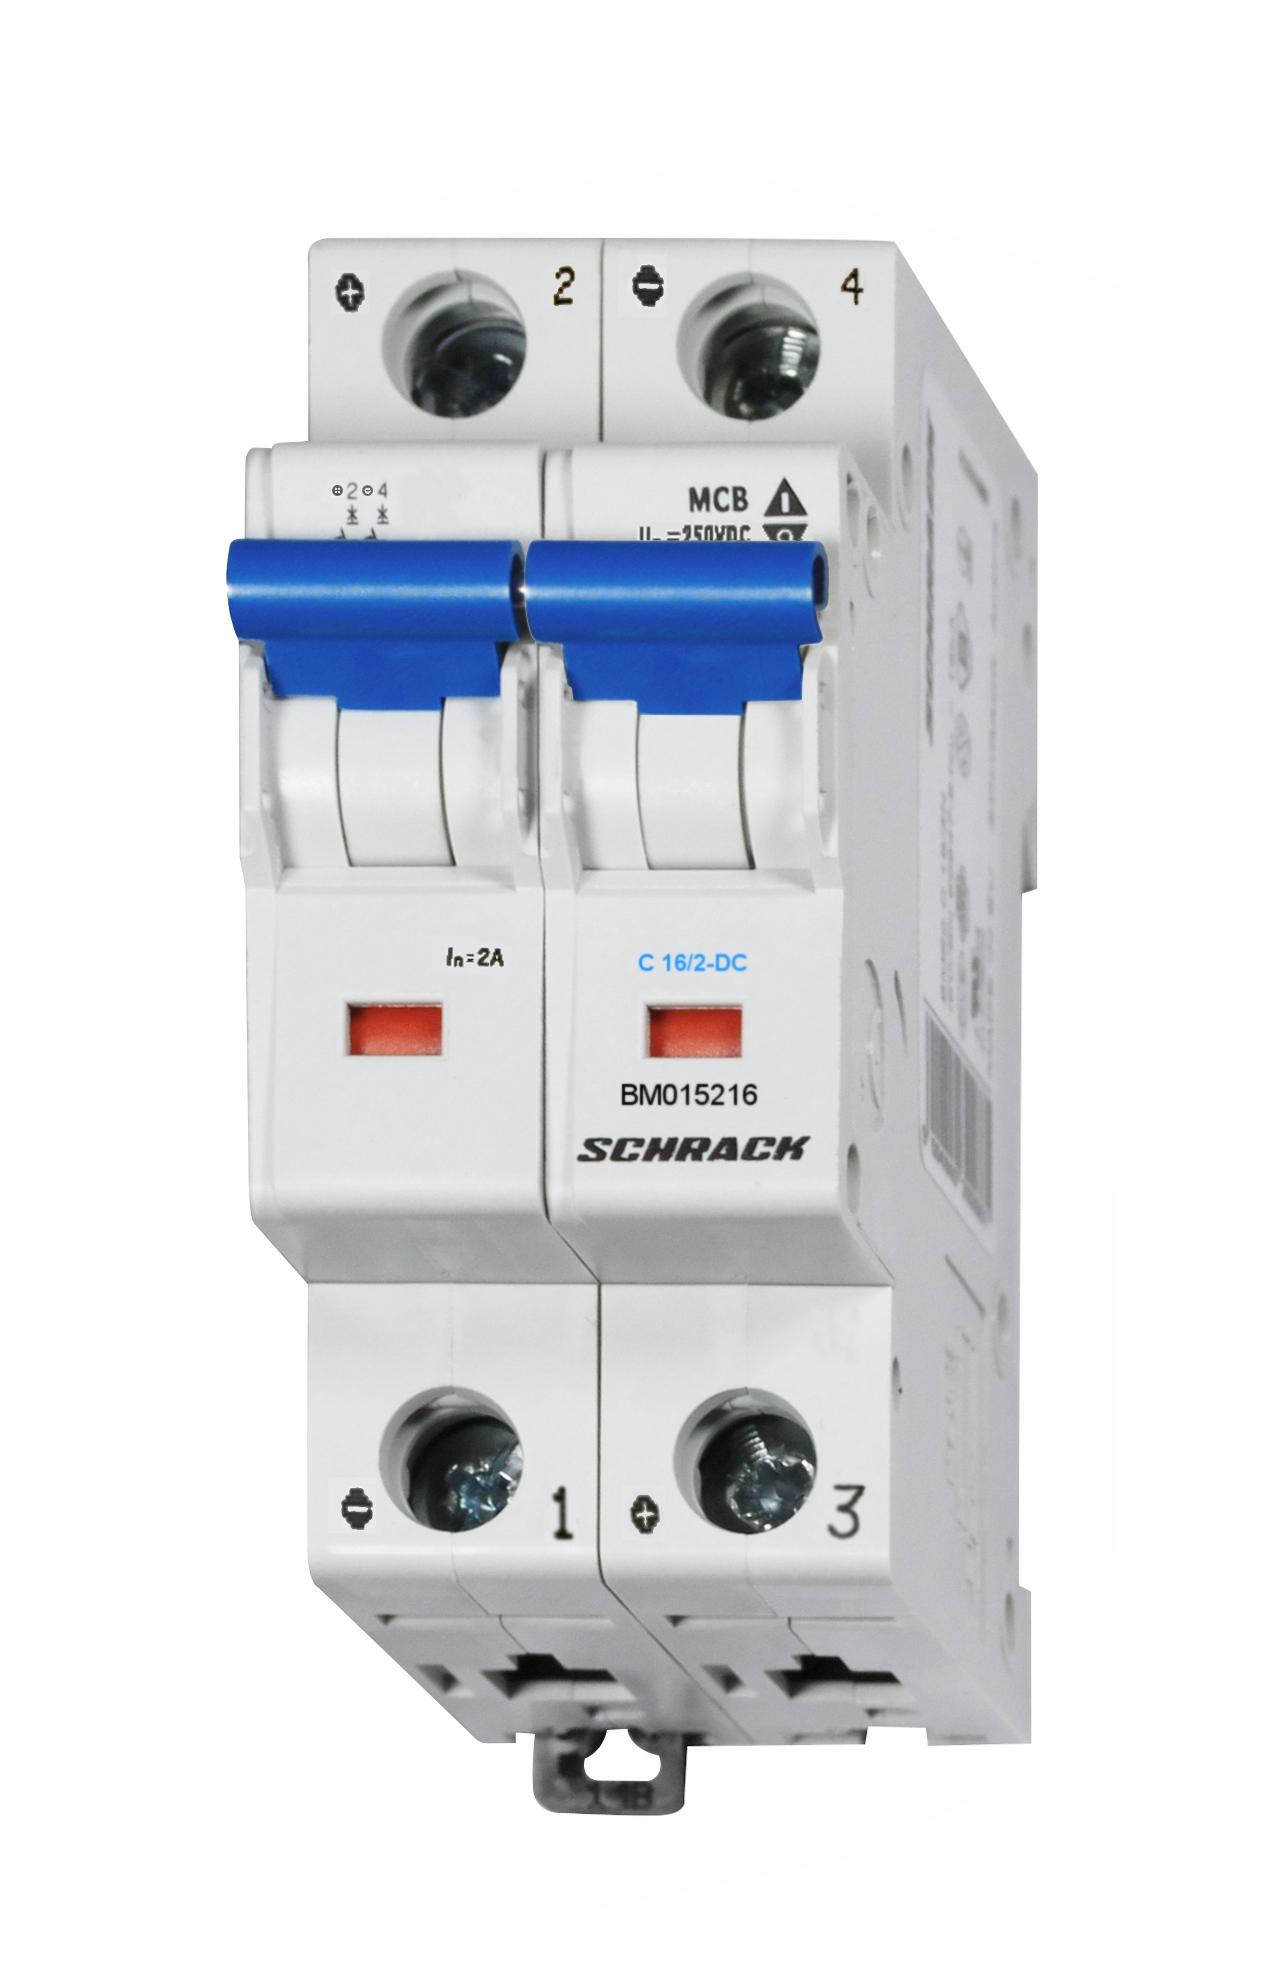 BM015216 - Schrack Technik